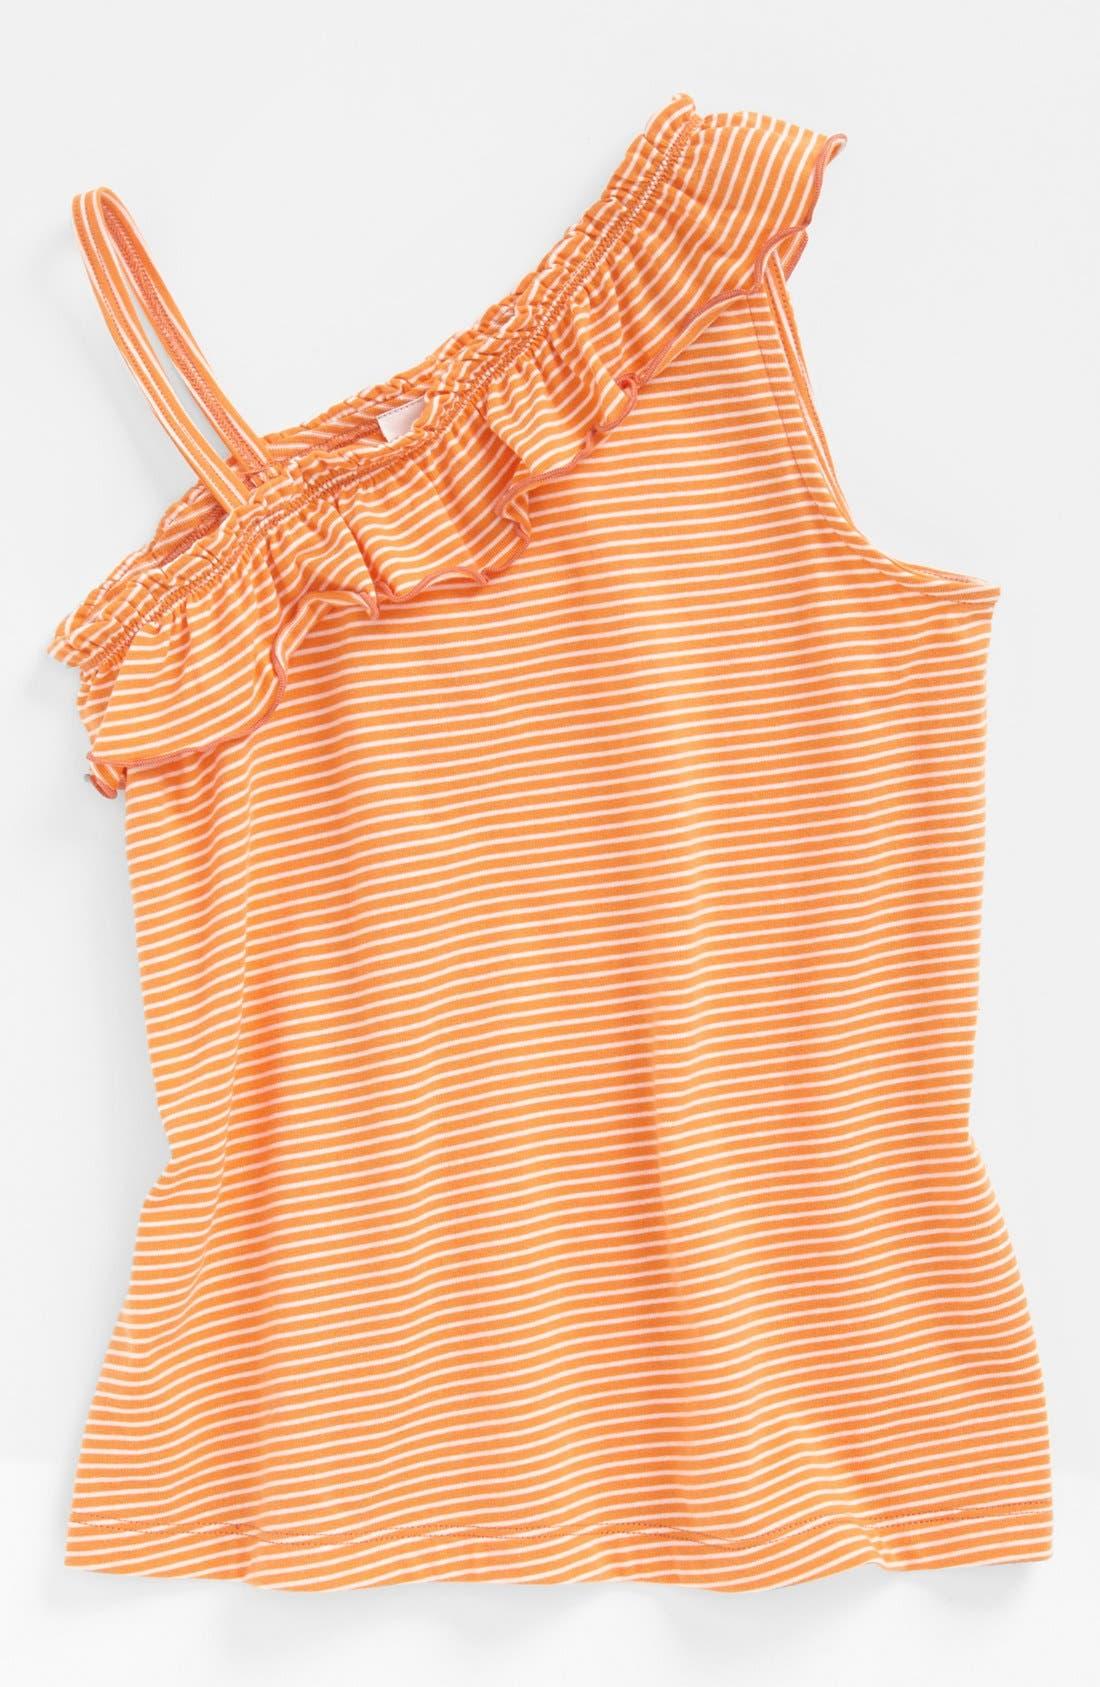 Alternate Image 1 Selected - Tucker + Tate 'Isabelle' Knit Top (Big Girls)